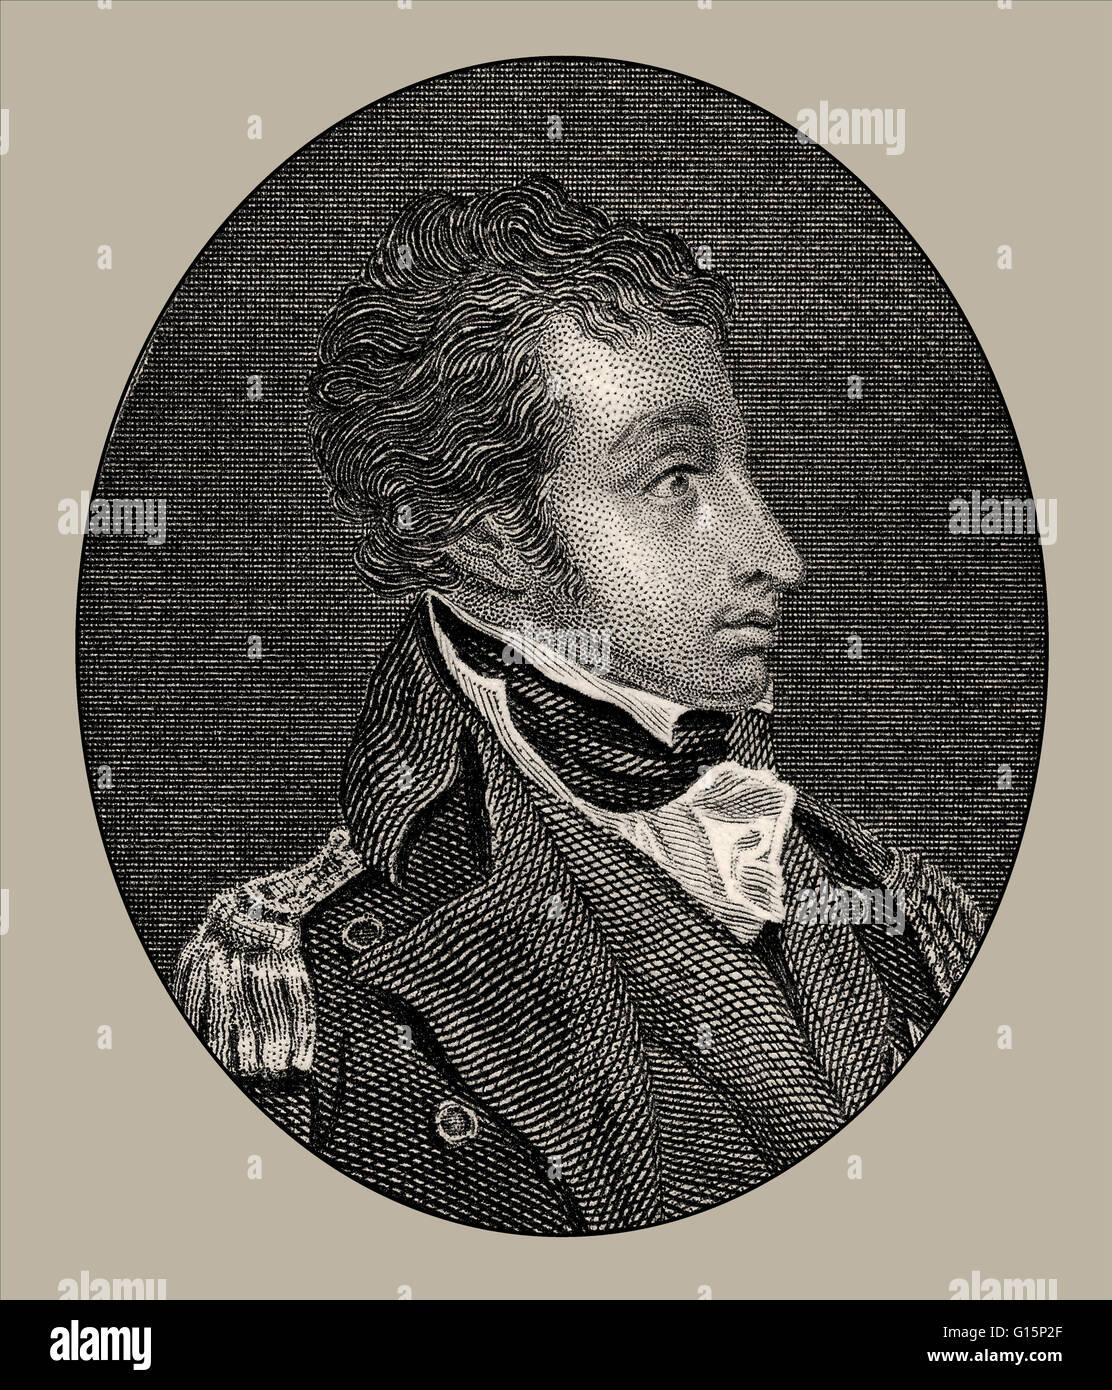 Naval Uniform 18th Century High Resolution Stock